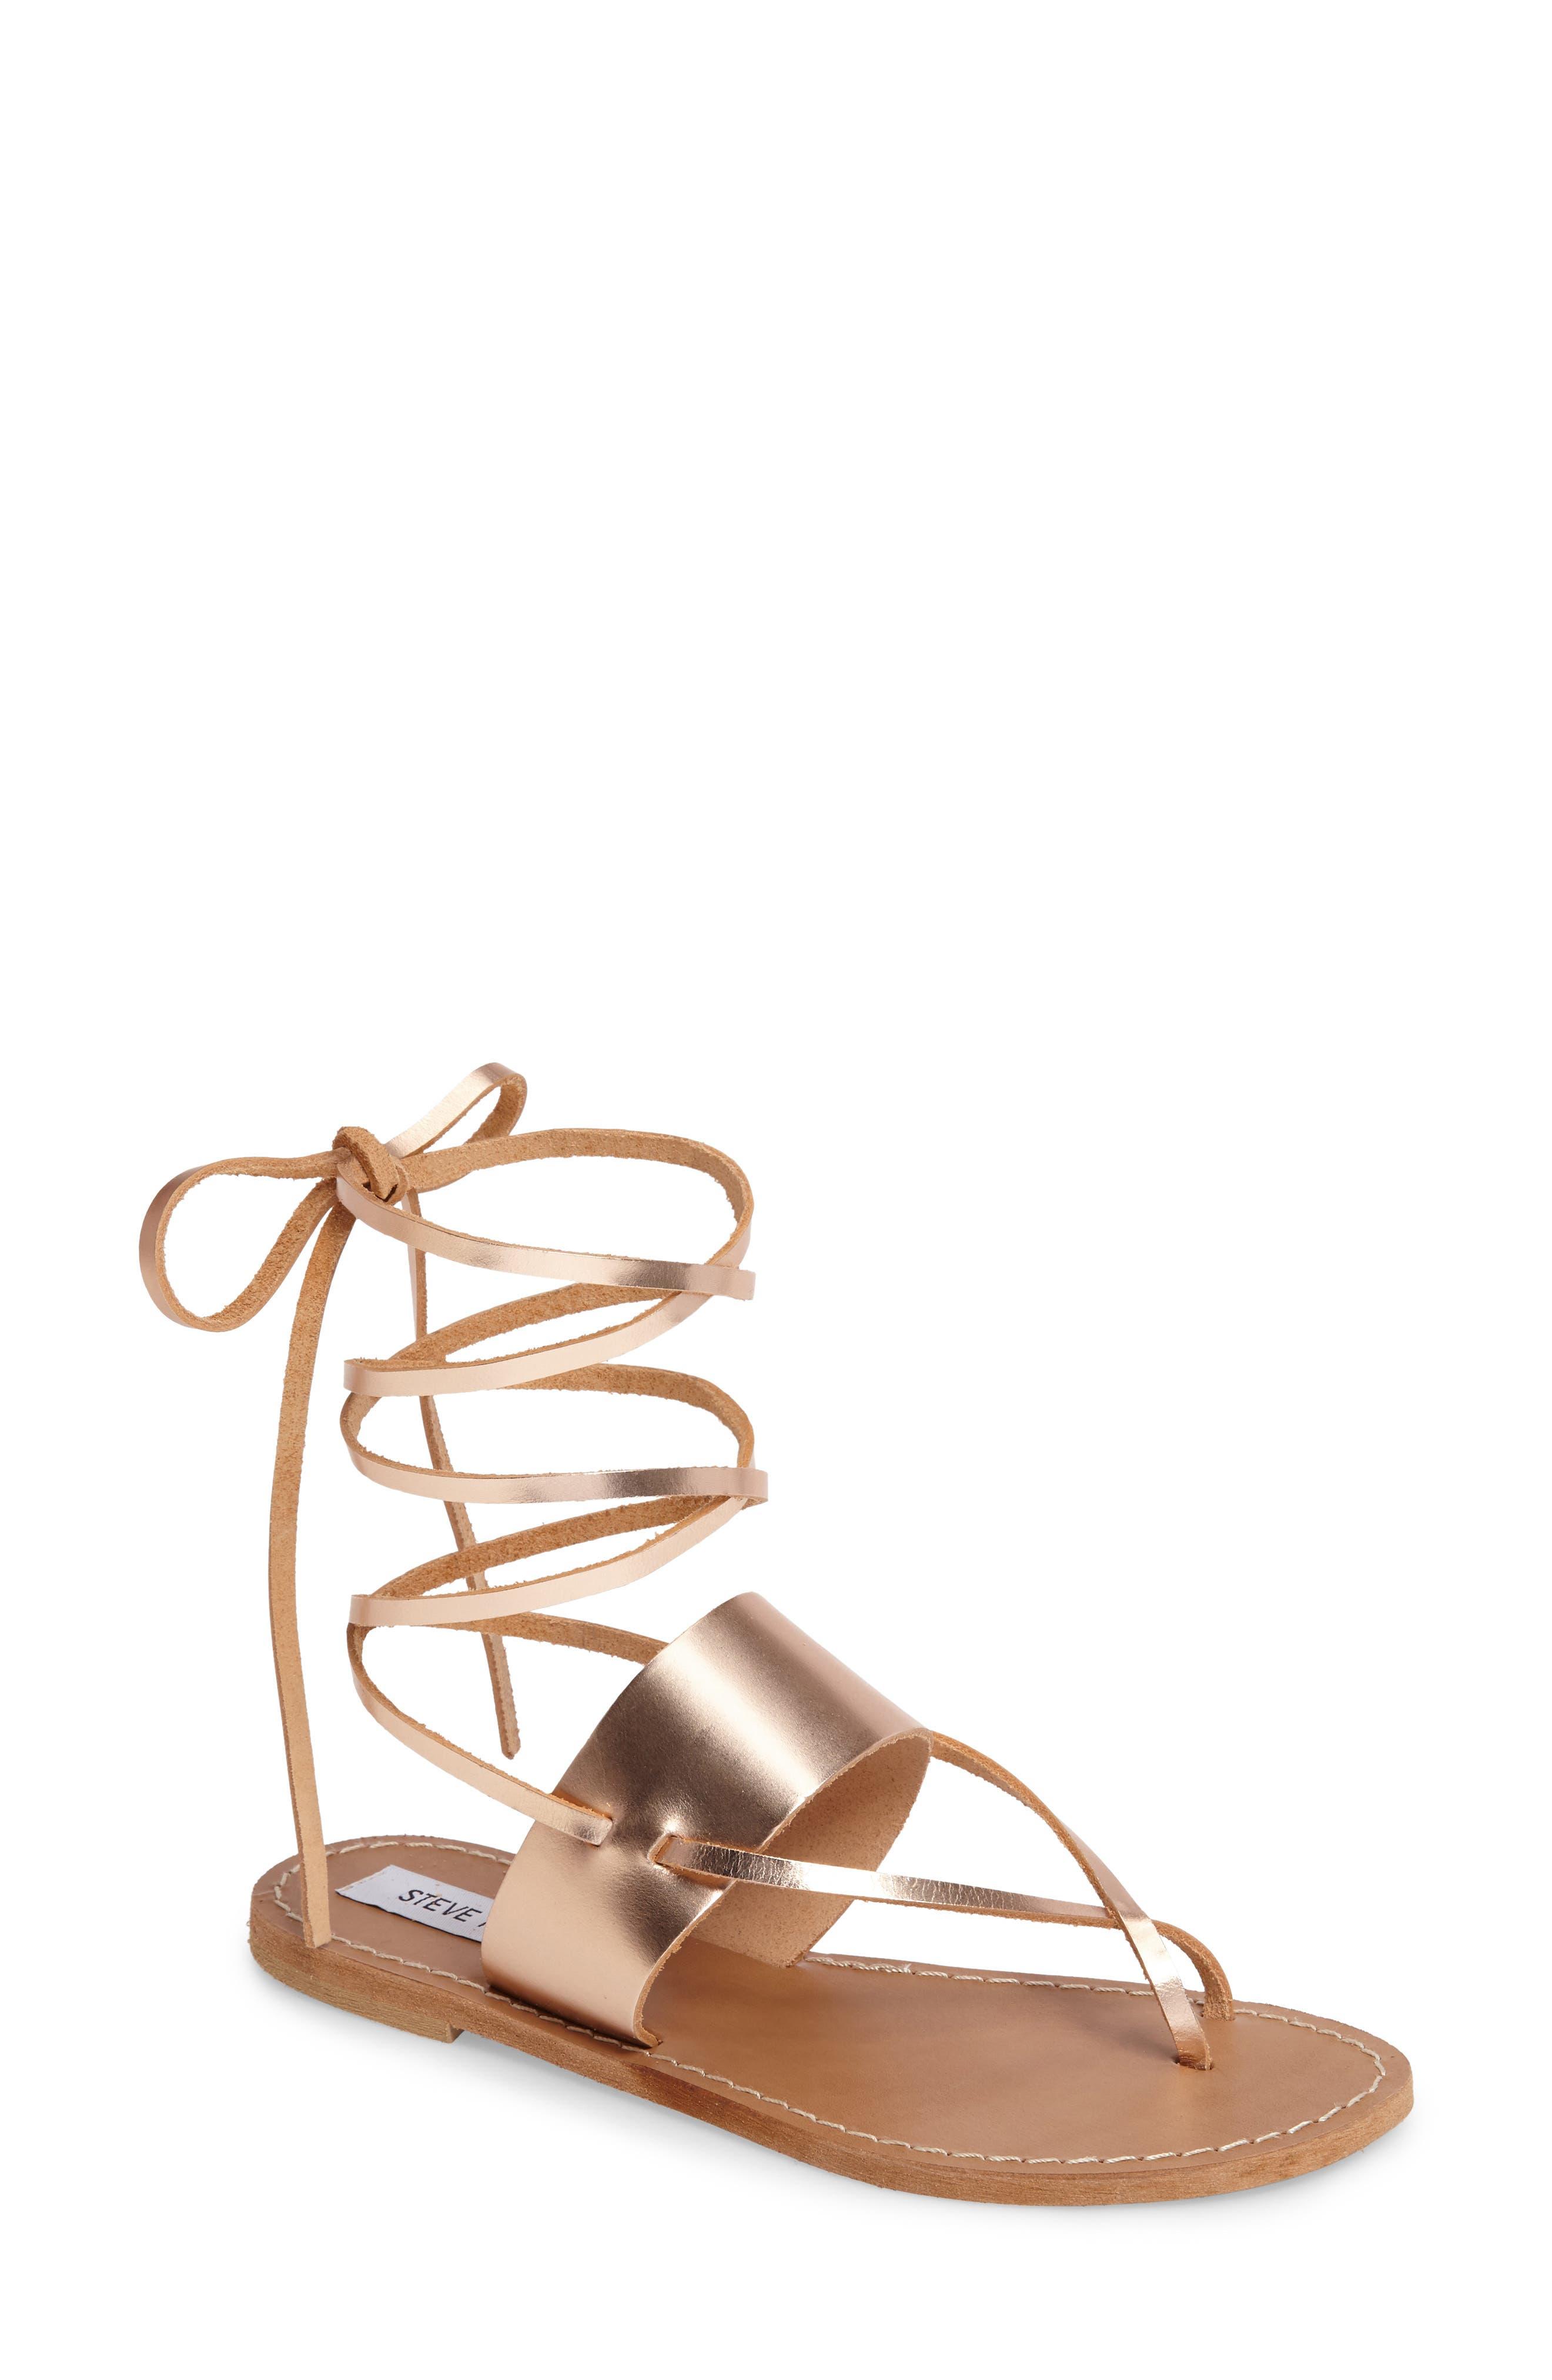 Alternate Image 1 Selected - Steve Madden Bianca Lace-Up Sandal (Women)